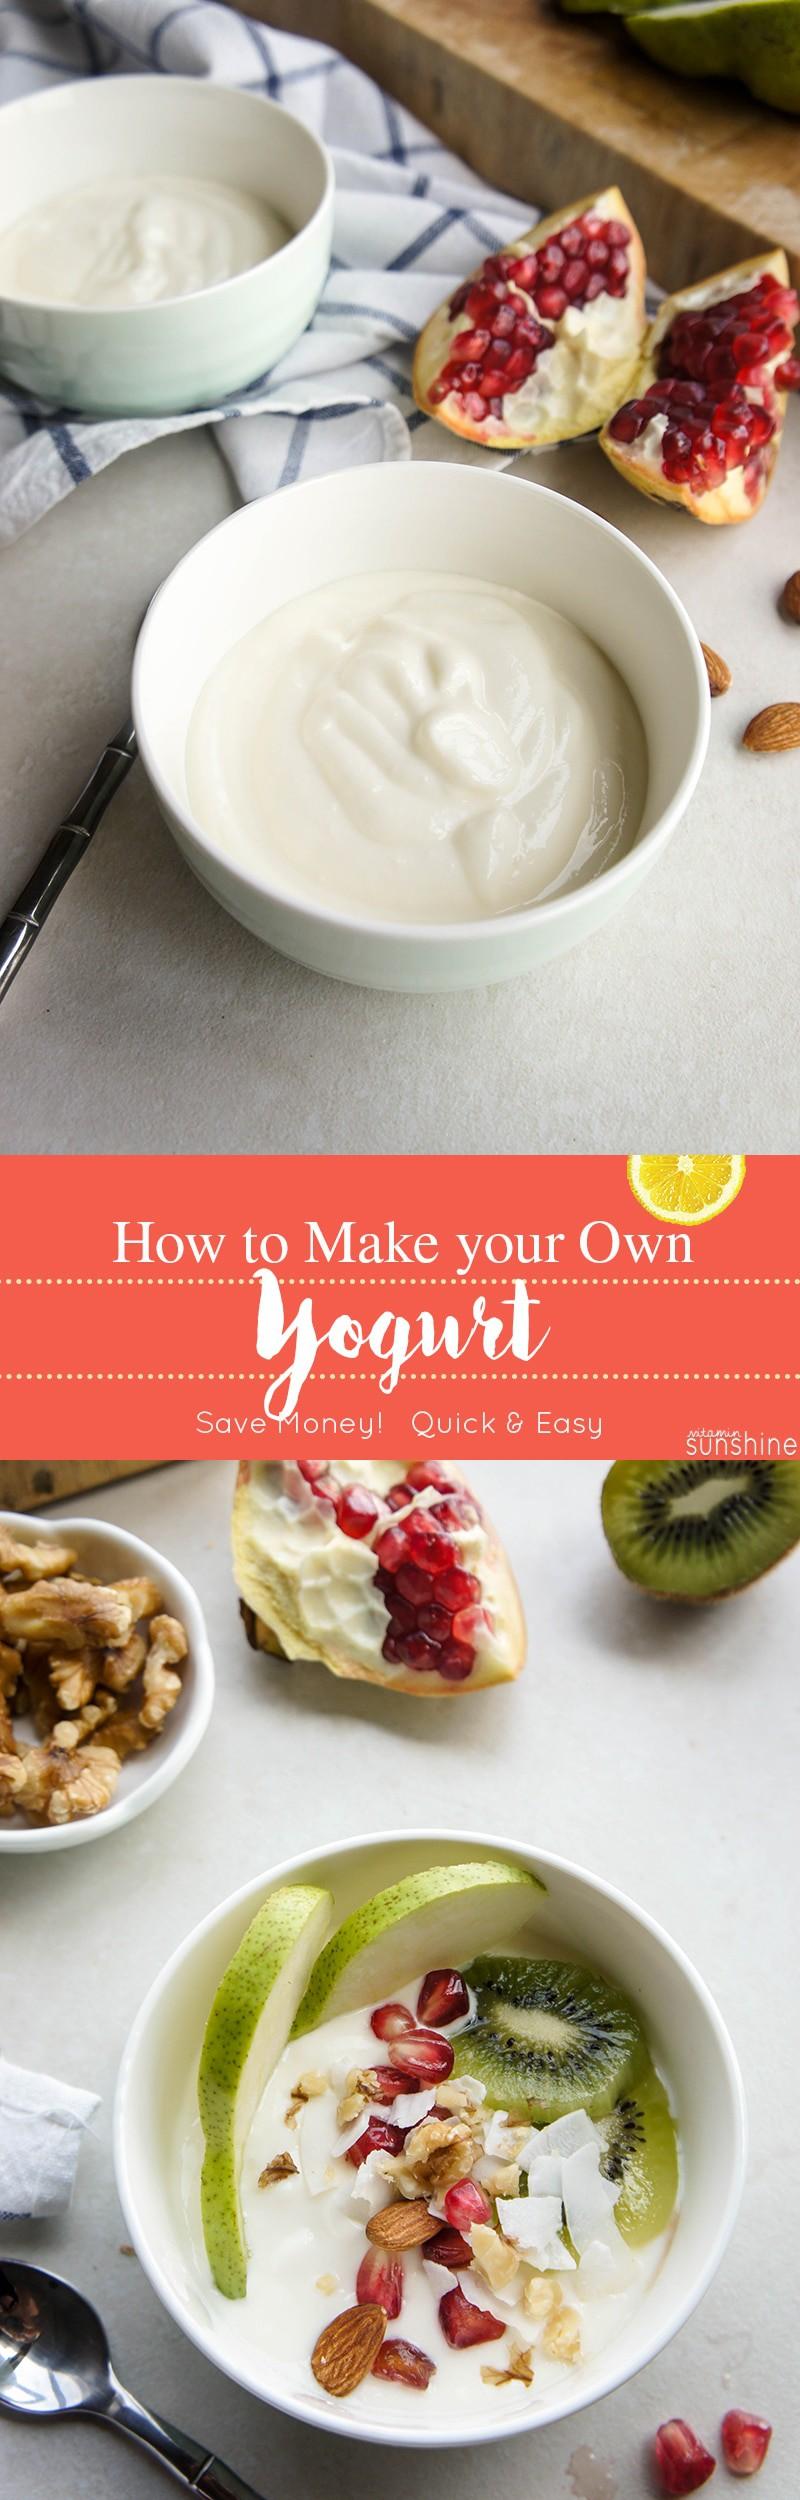 How to Make Yogurt / Thick and creamy yogurt is easy to make, and will save you money!